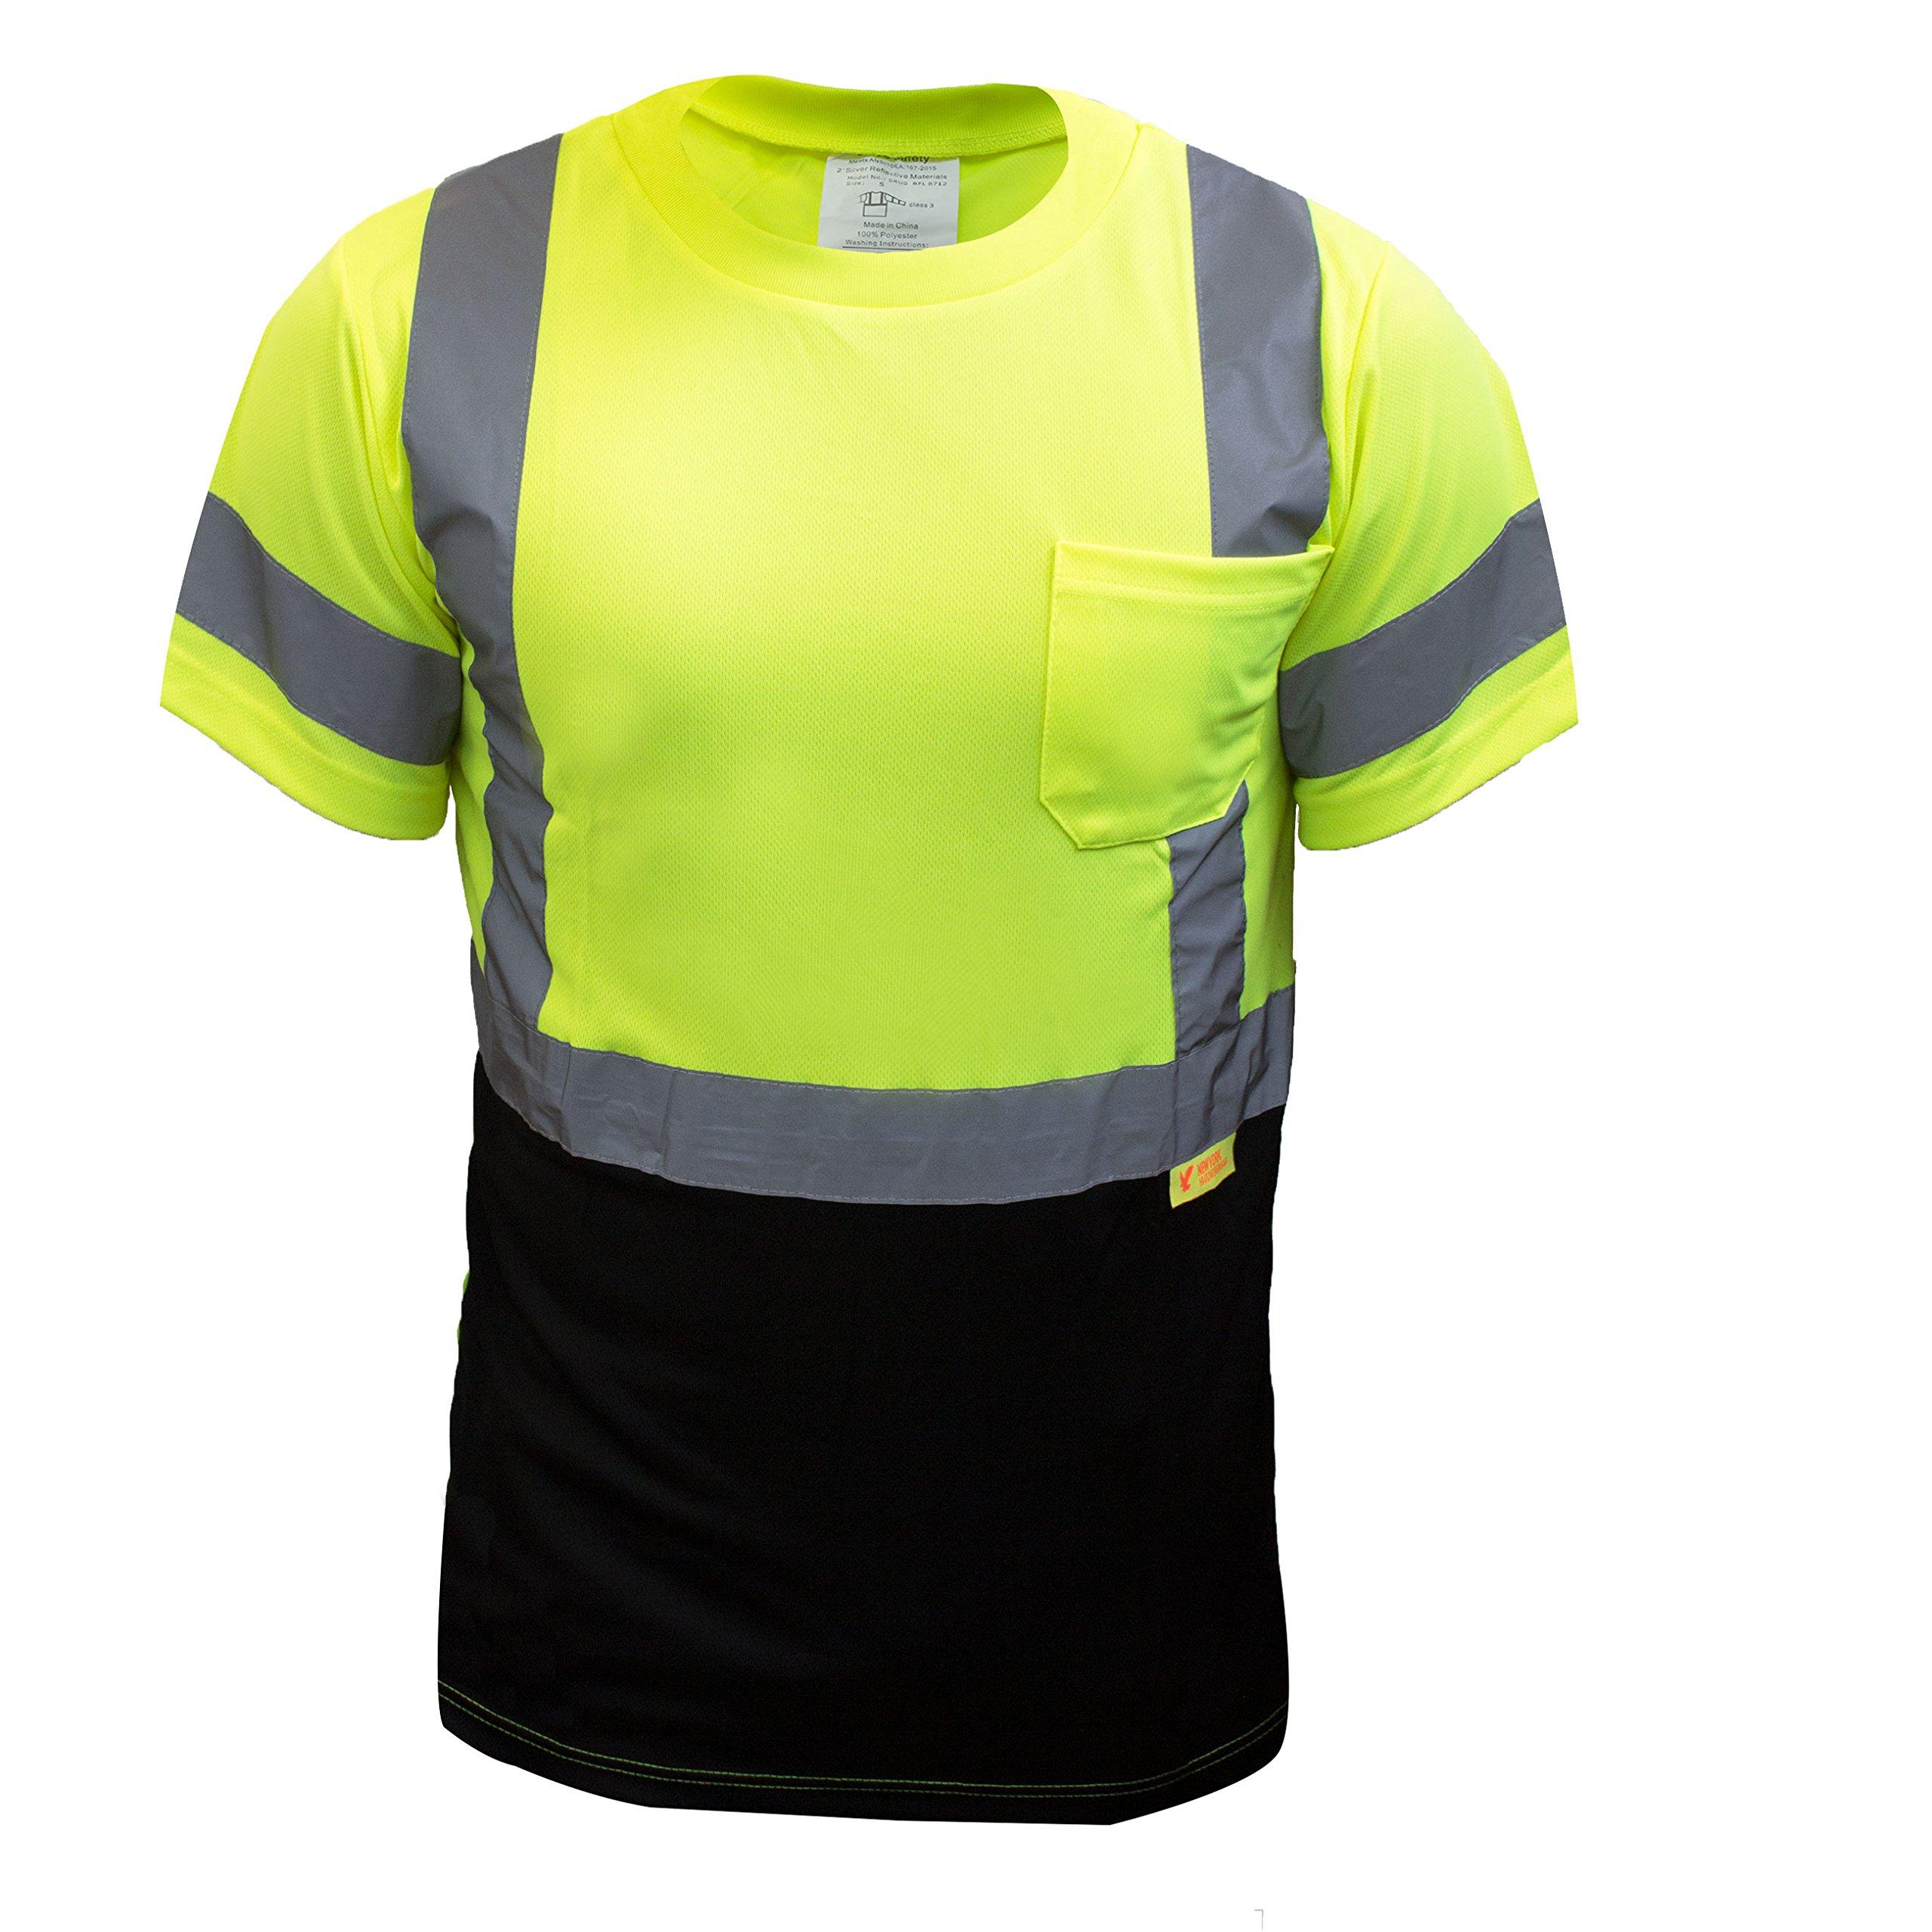 NY BFS High-Visibility Class 3 T Shirt with Moisture Wicking Mesh Birdseye, Black Bottom (Set of 5 (5XL), Green)